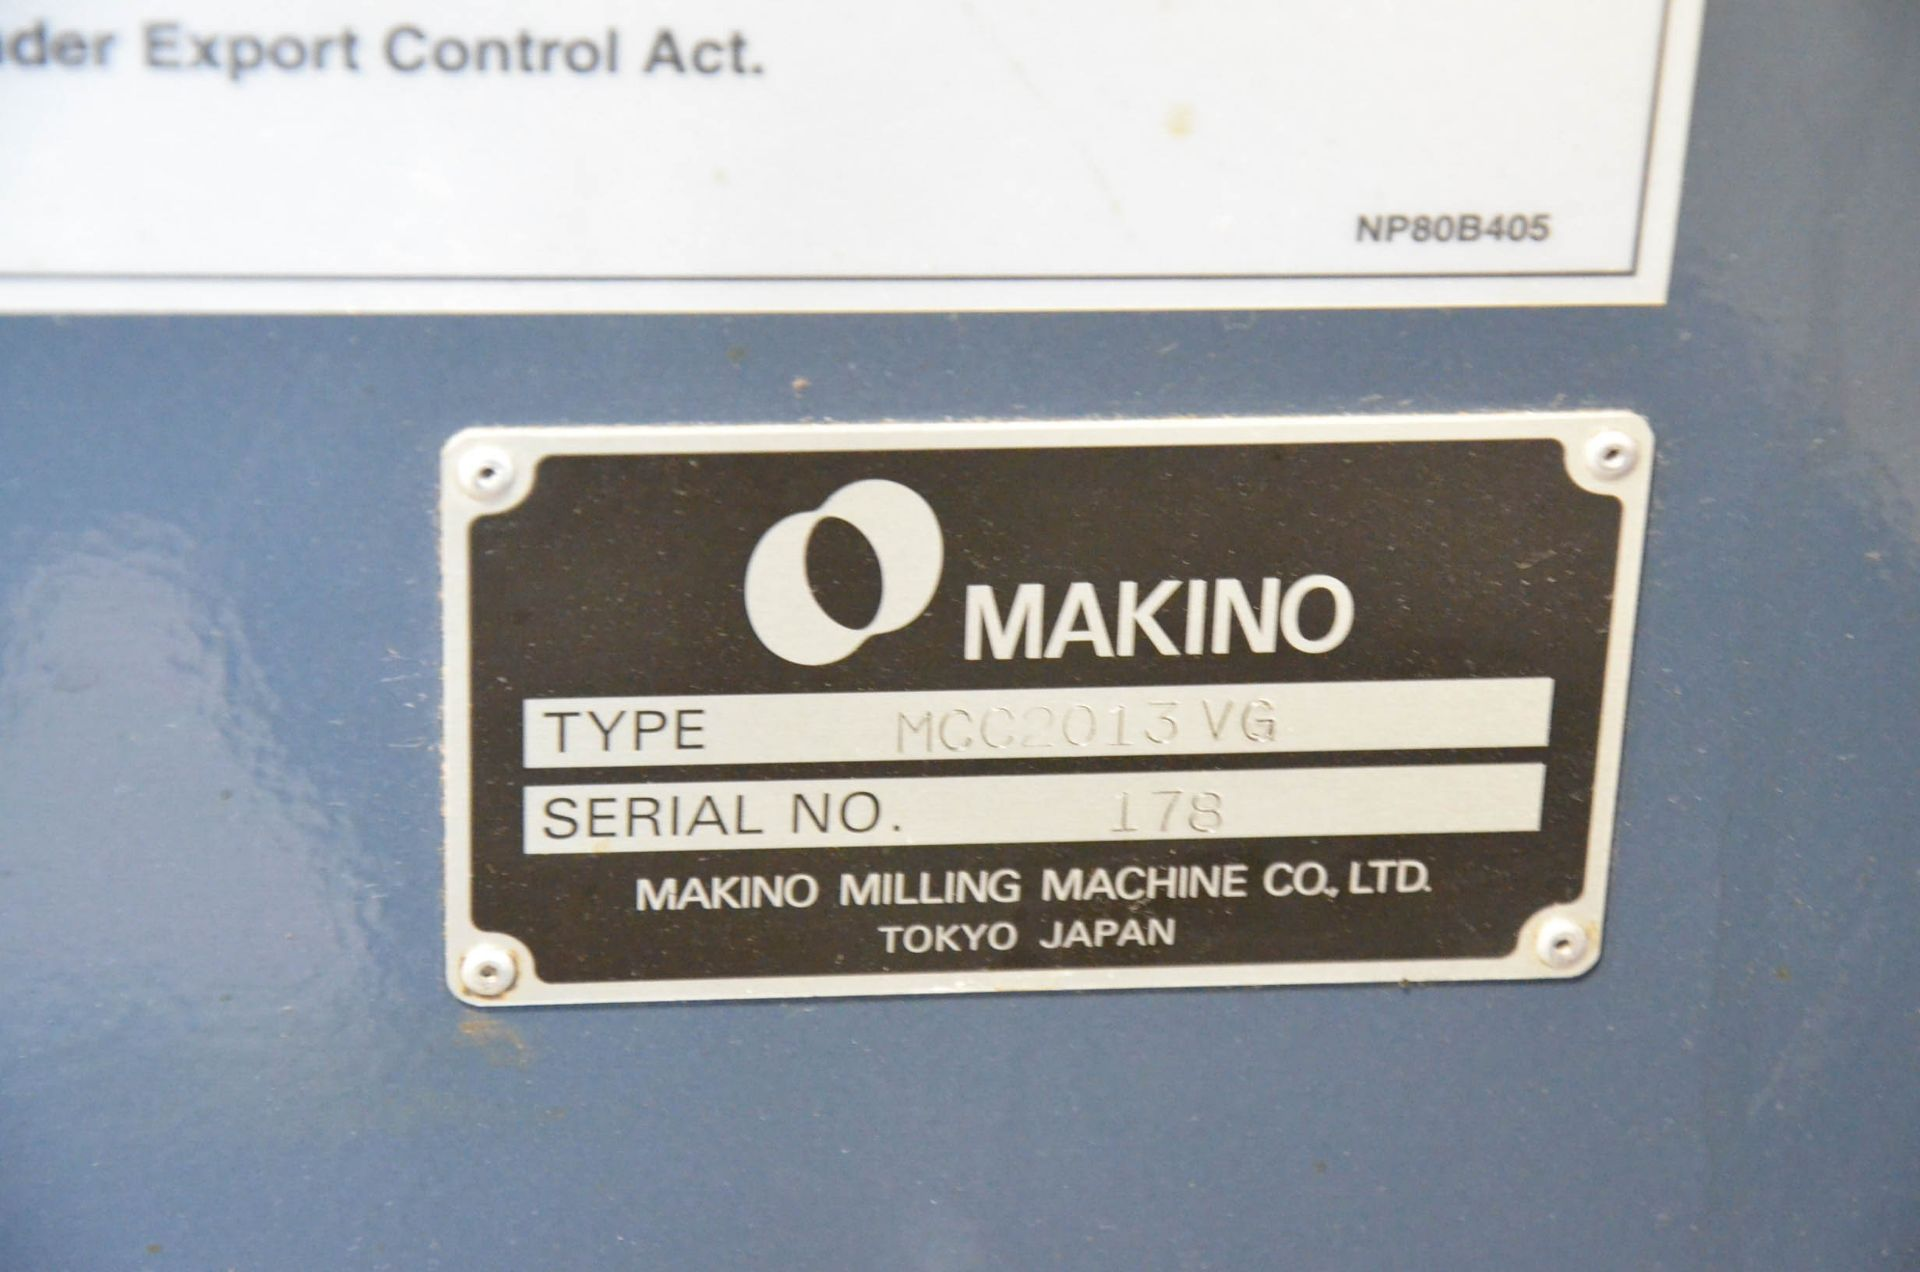 "MAKINO (2013) MCC2013 VG 6-AXIS CNC MACHINING CENTER WITH MAKINO PROFESSIONAL 5 CNC CONTROL, 59"" X - Image 5 of 11"